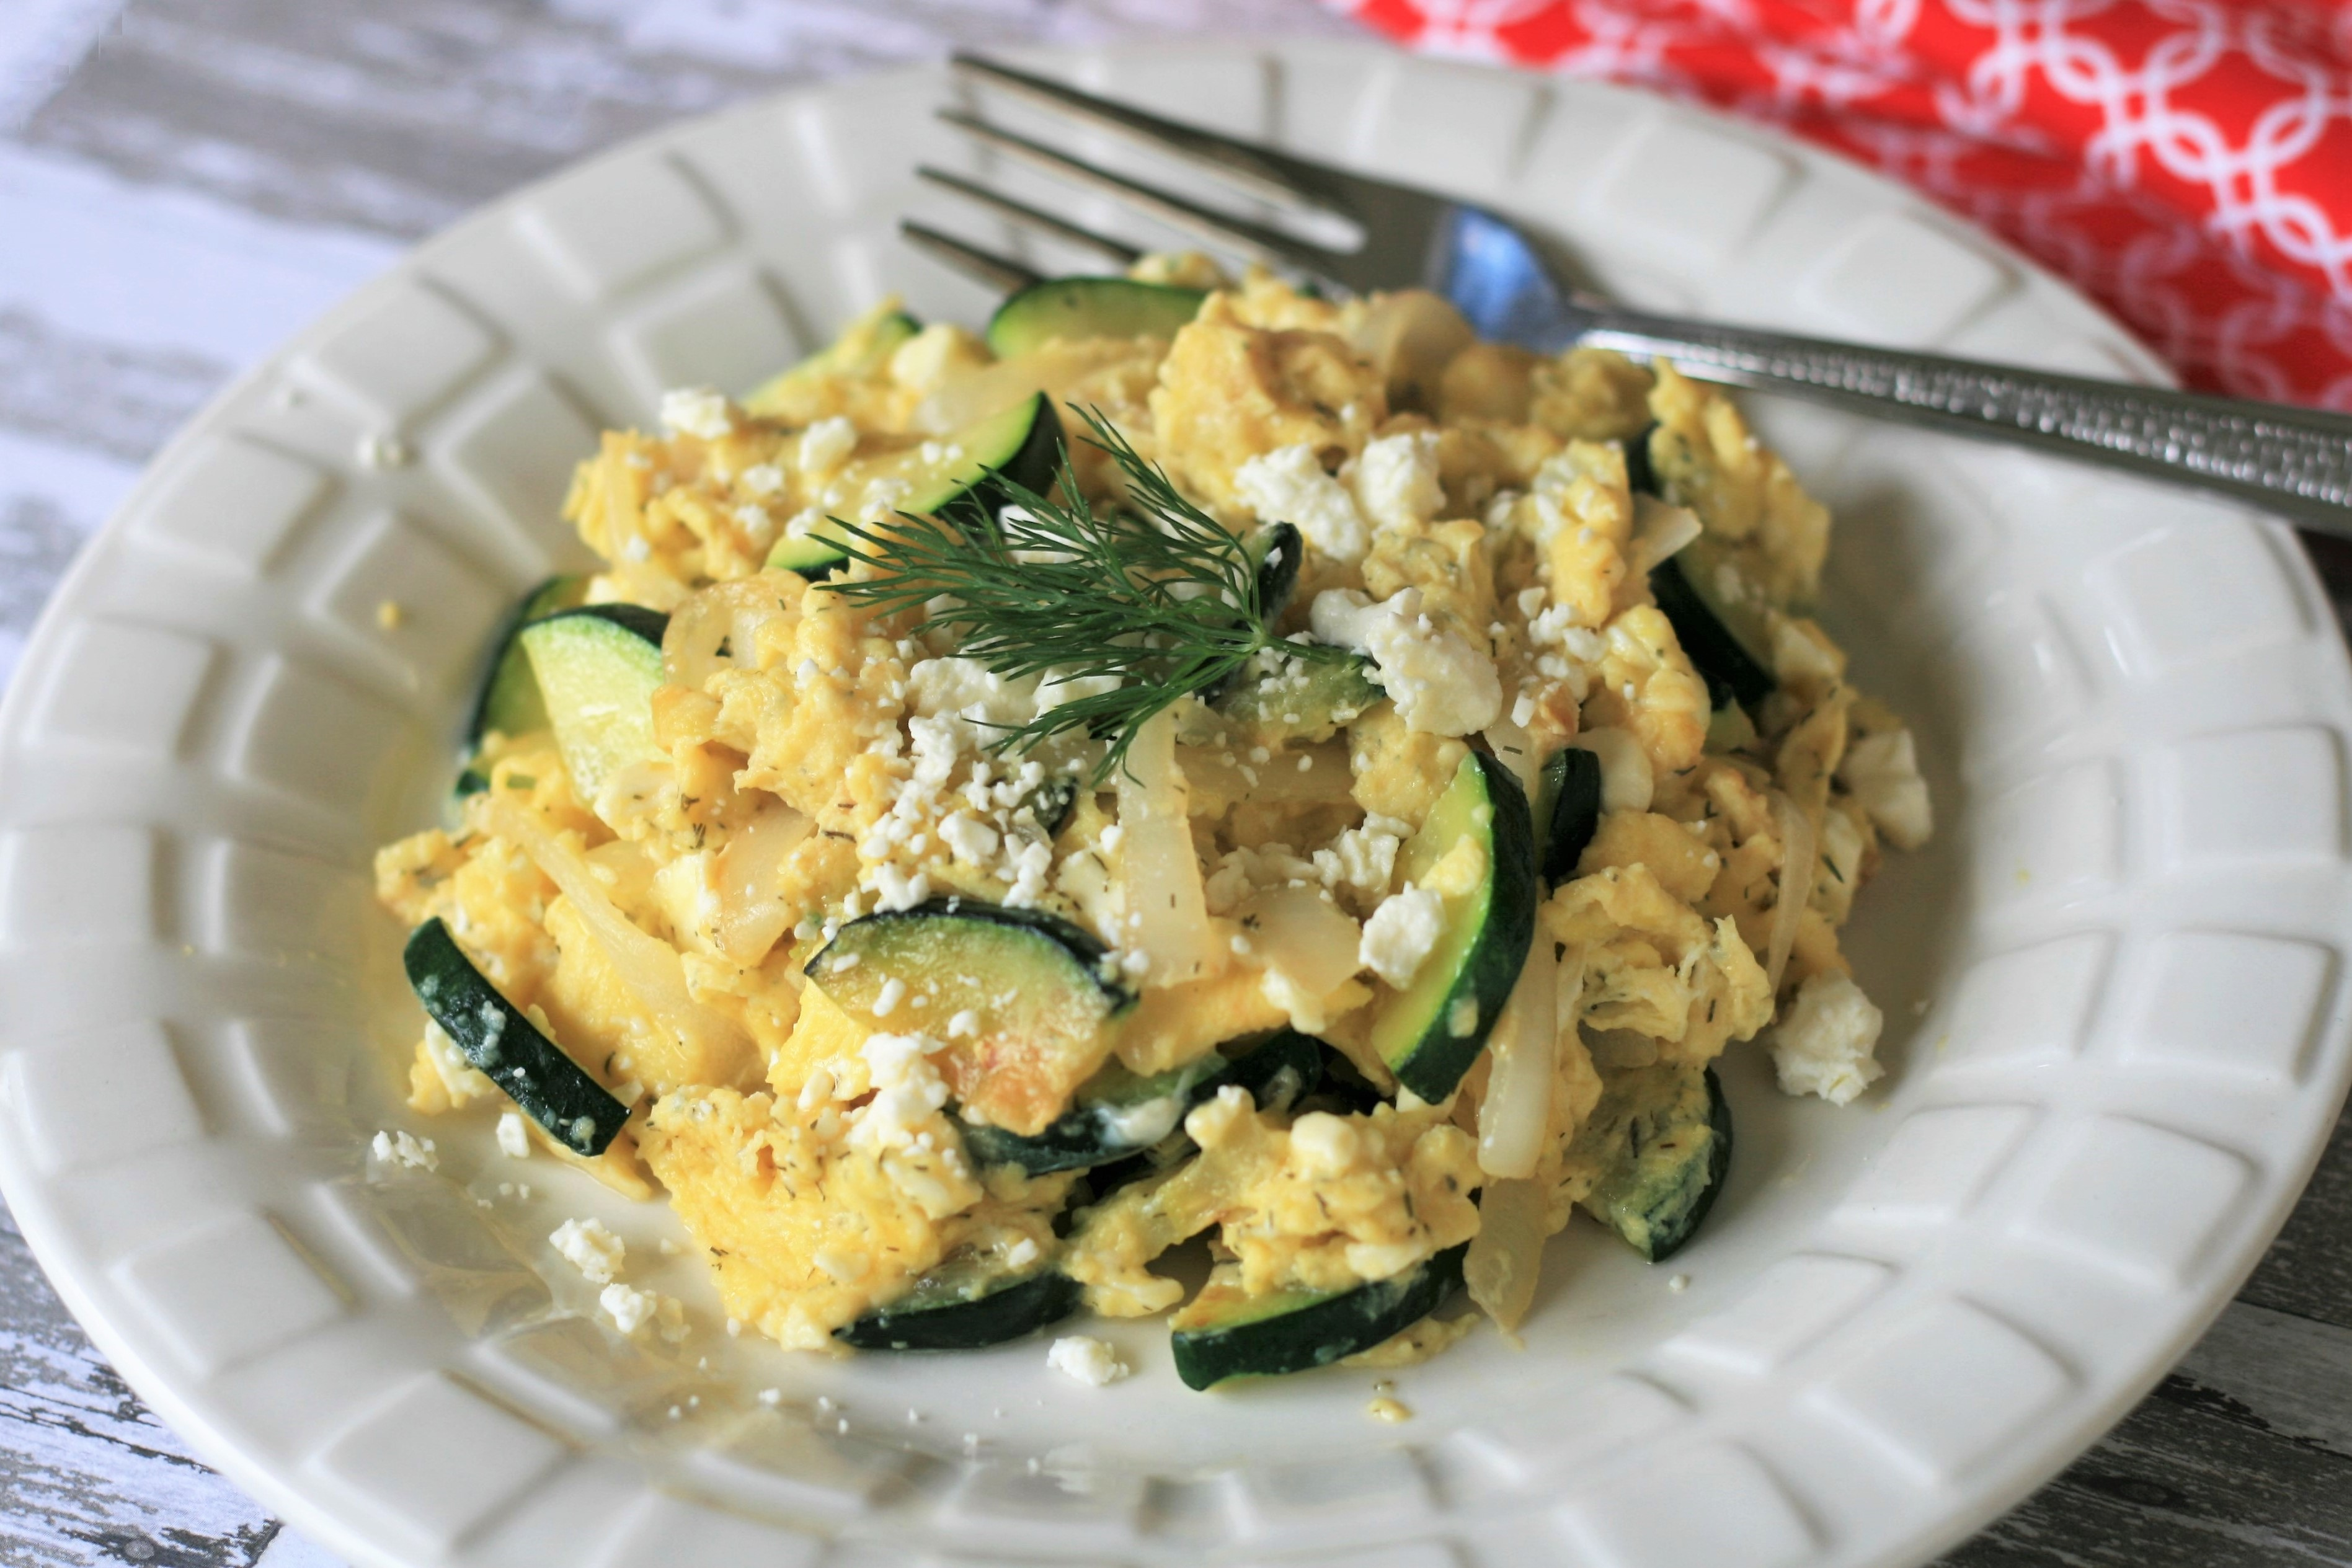 Scrambled Eggs with Zucchini and Feta